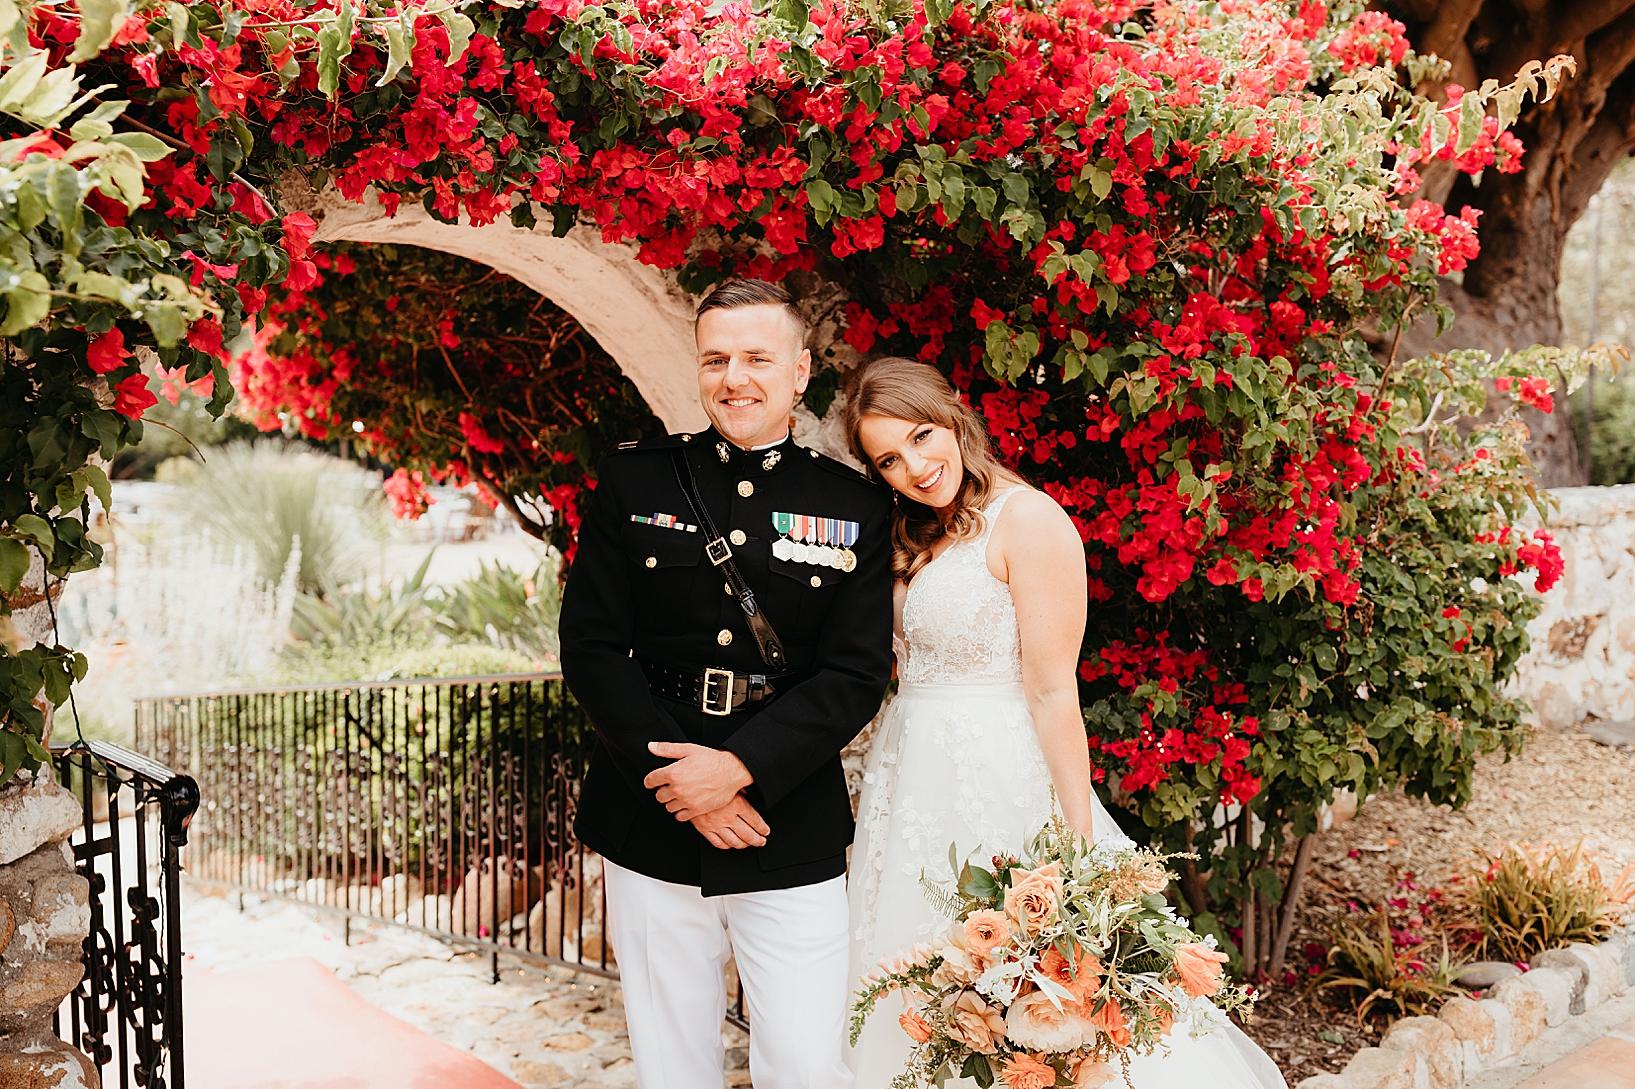 Leo-Carrillo-Ranch-Wedding-32.jpg